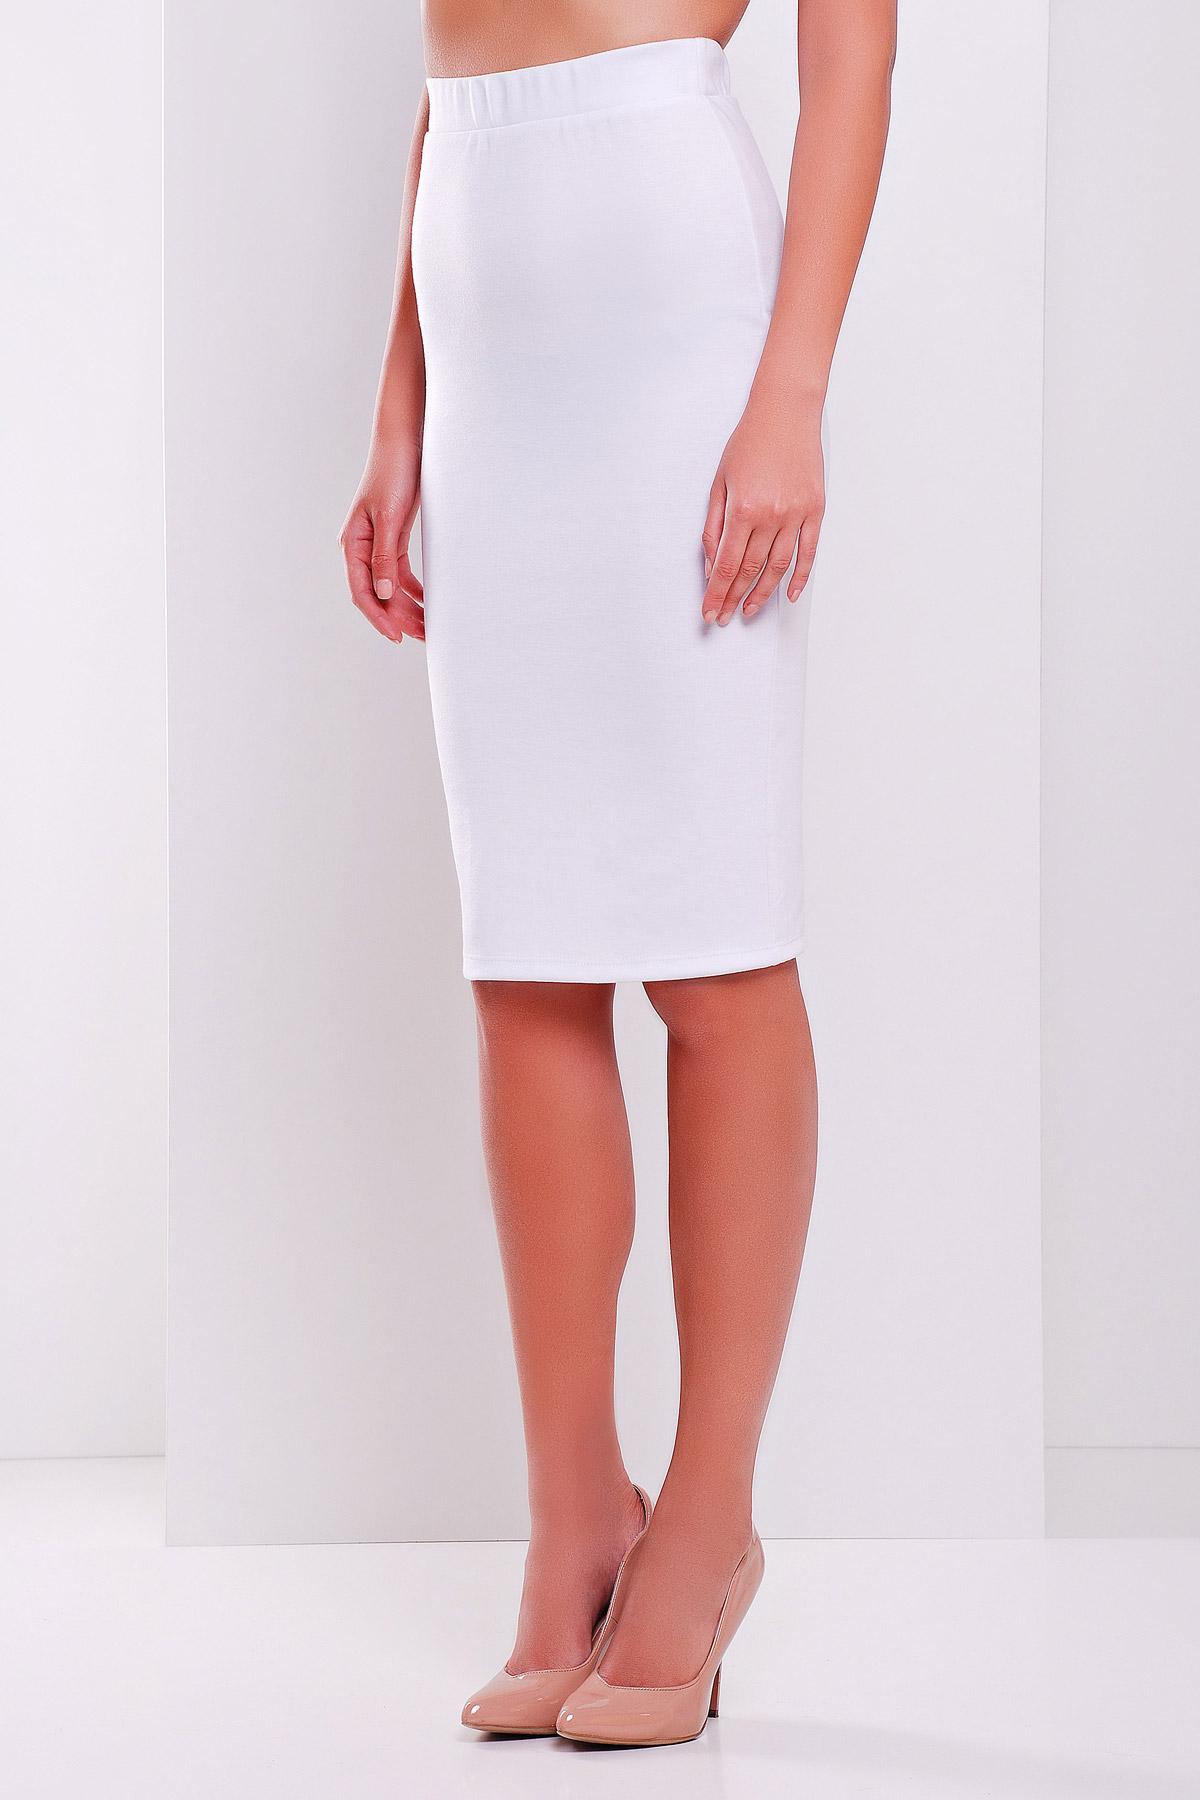 черная юбка-карандаш до колена. юбка мод. №20. Цвет: белый